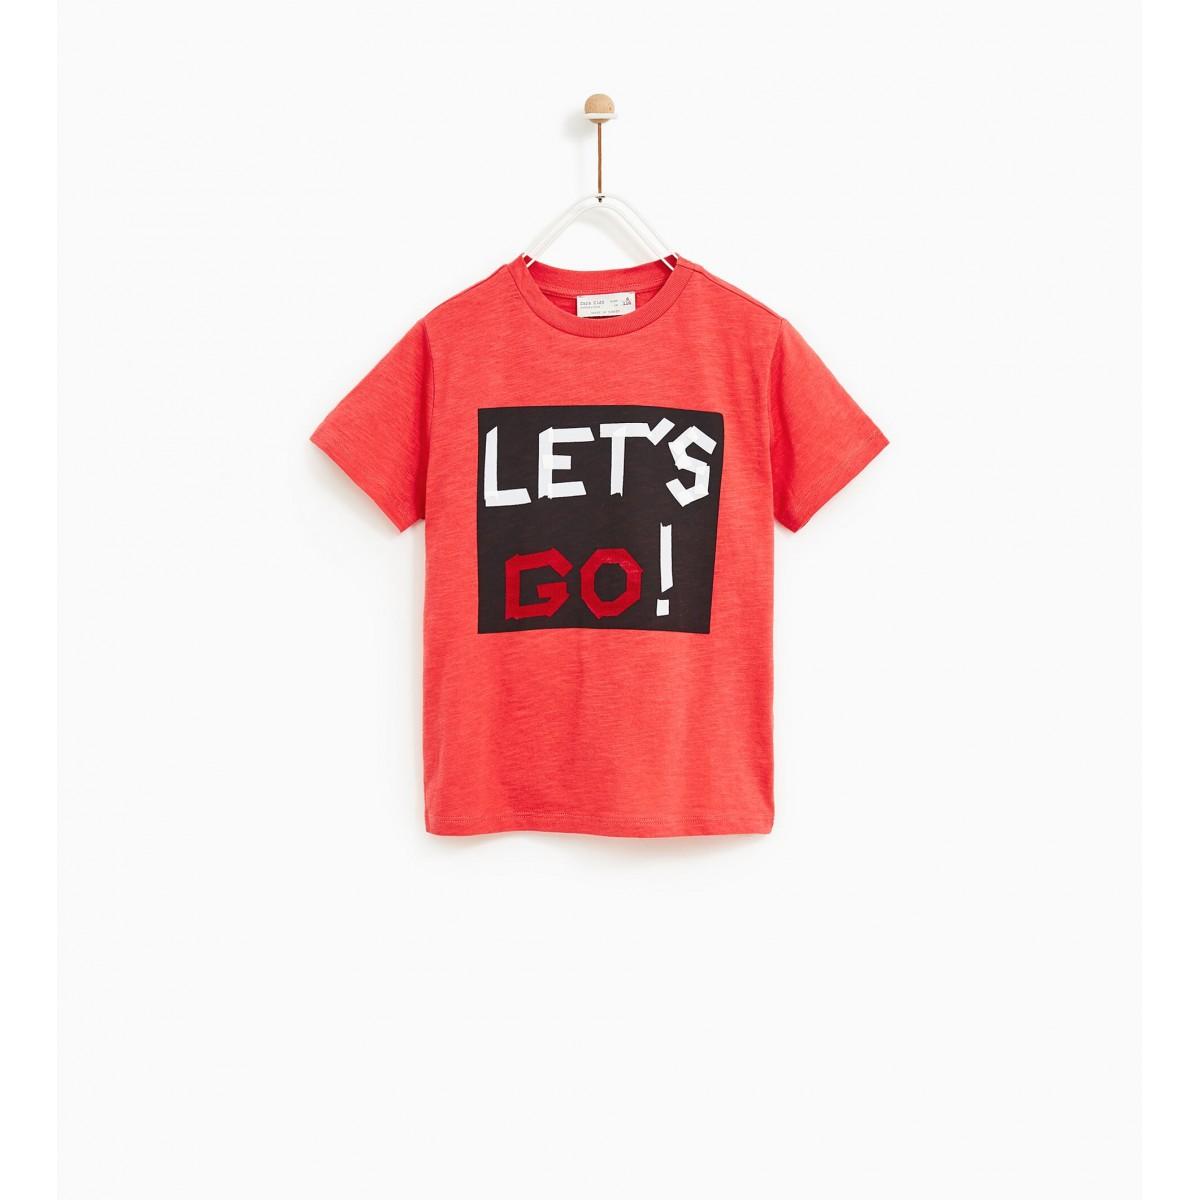 Zara 'Let's Go' Print T-Shirt